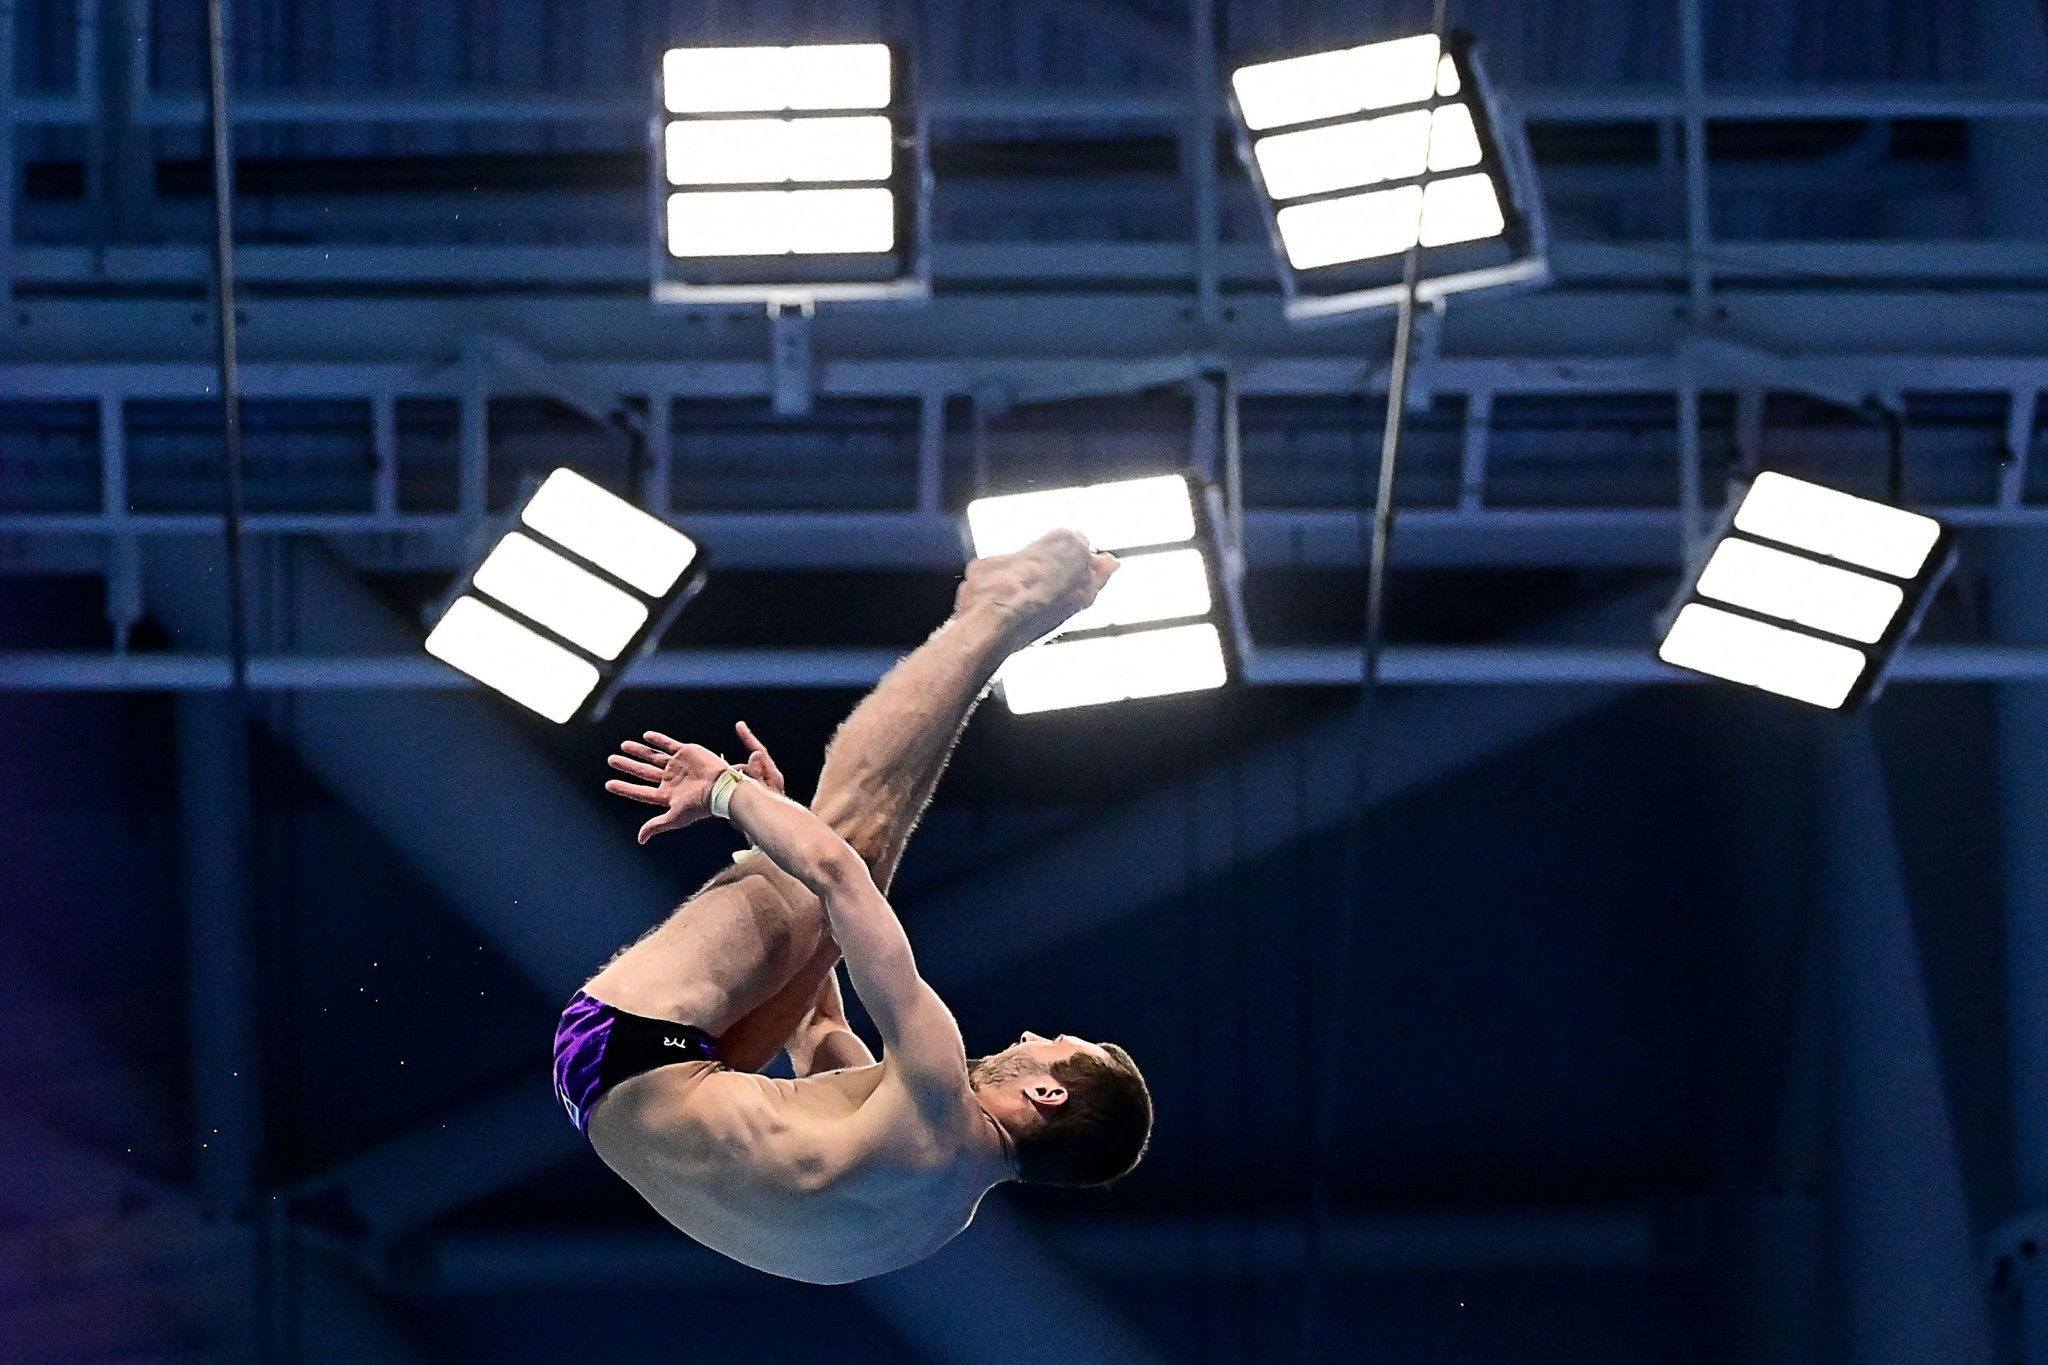 Bondar crowns Russia's diving dominance with 10m title at European Aquatics Championships